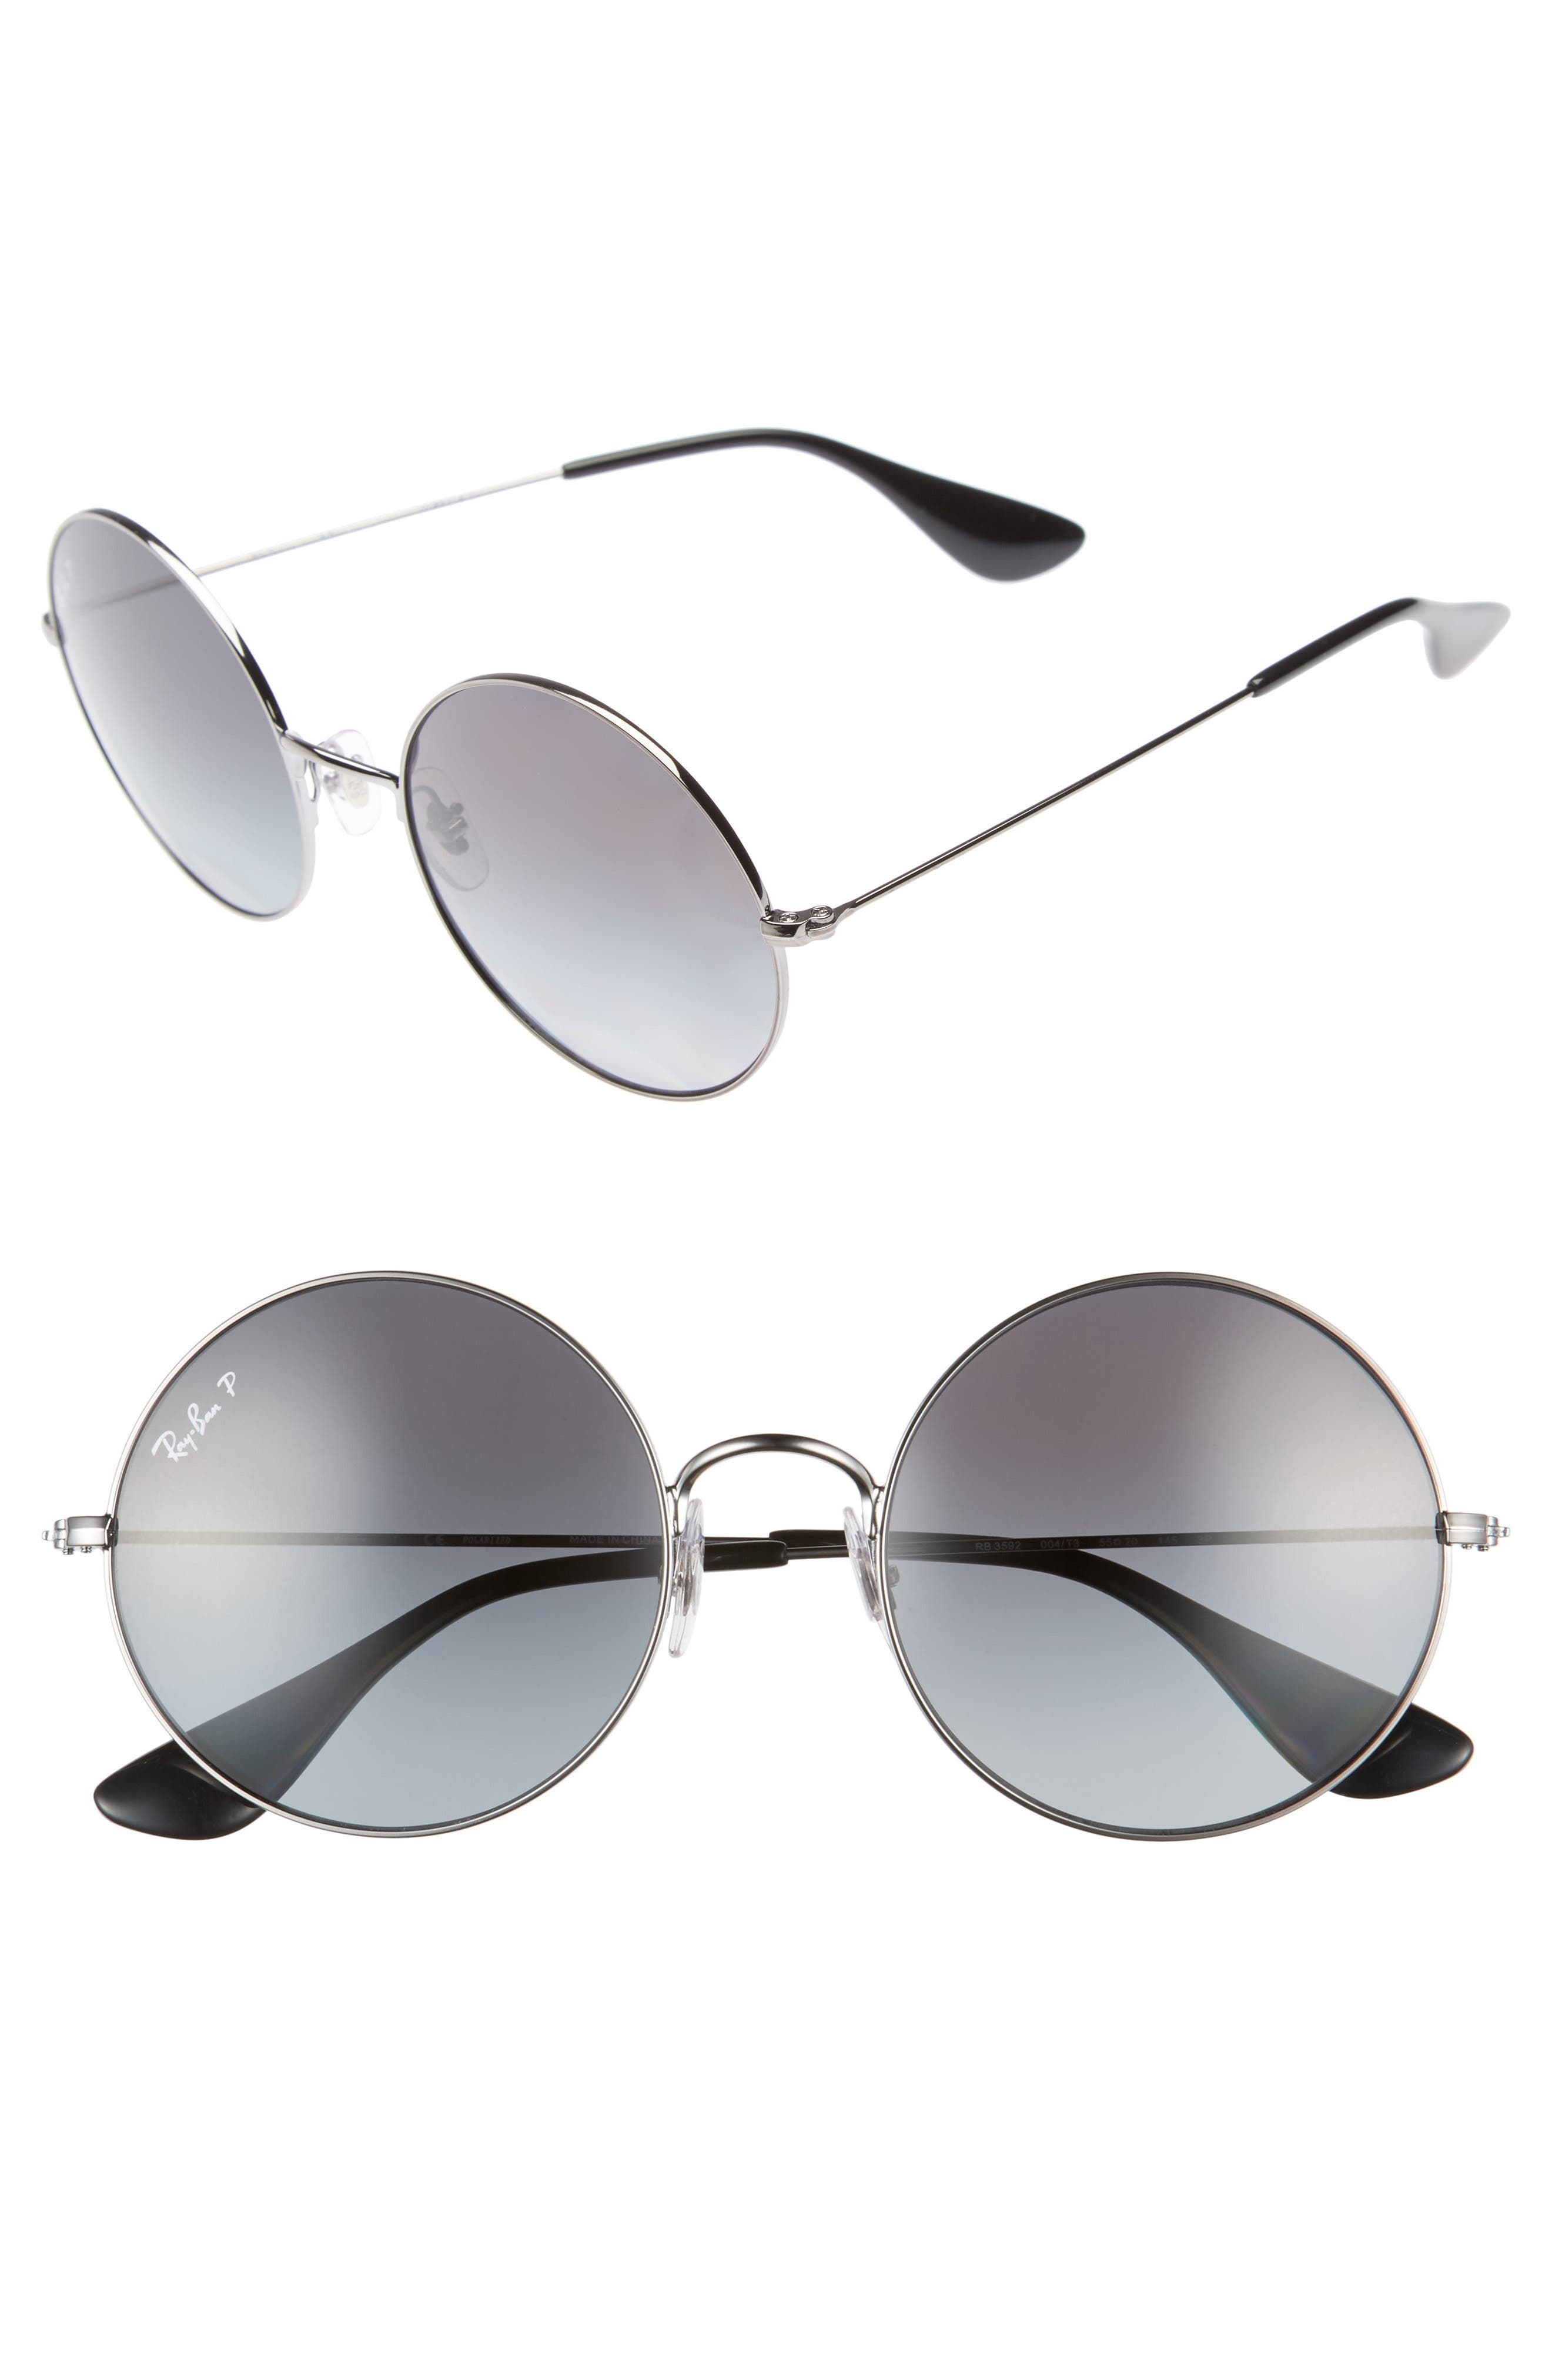 55mm Polarized Round Sunglasses,                         Main,                         color, 020